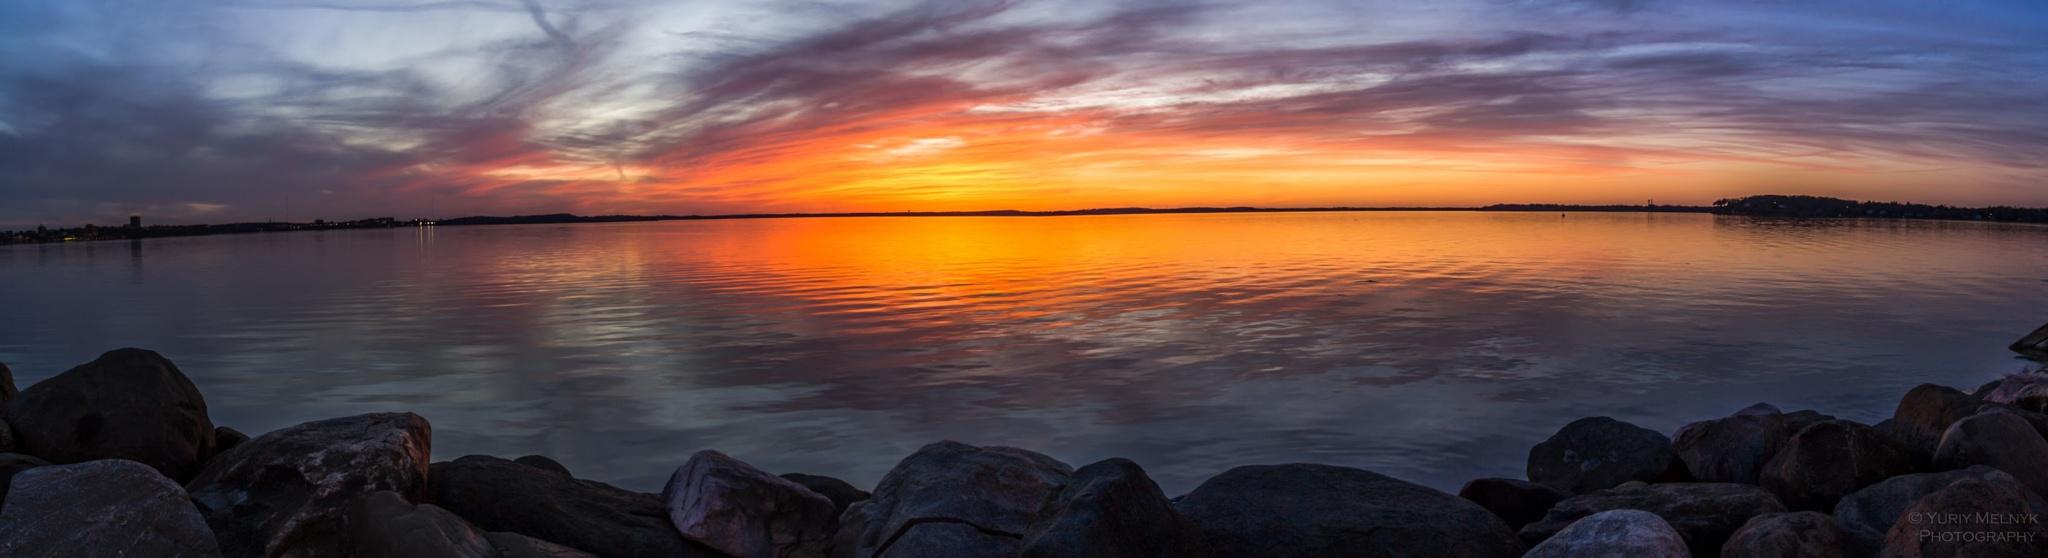 Panoramic photo of the lake by Yuriy Melnyk Photography